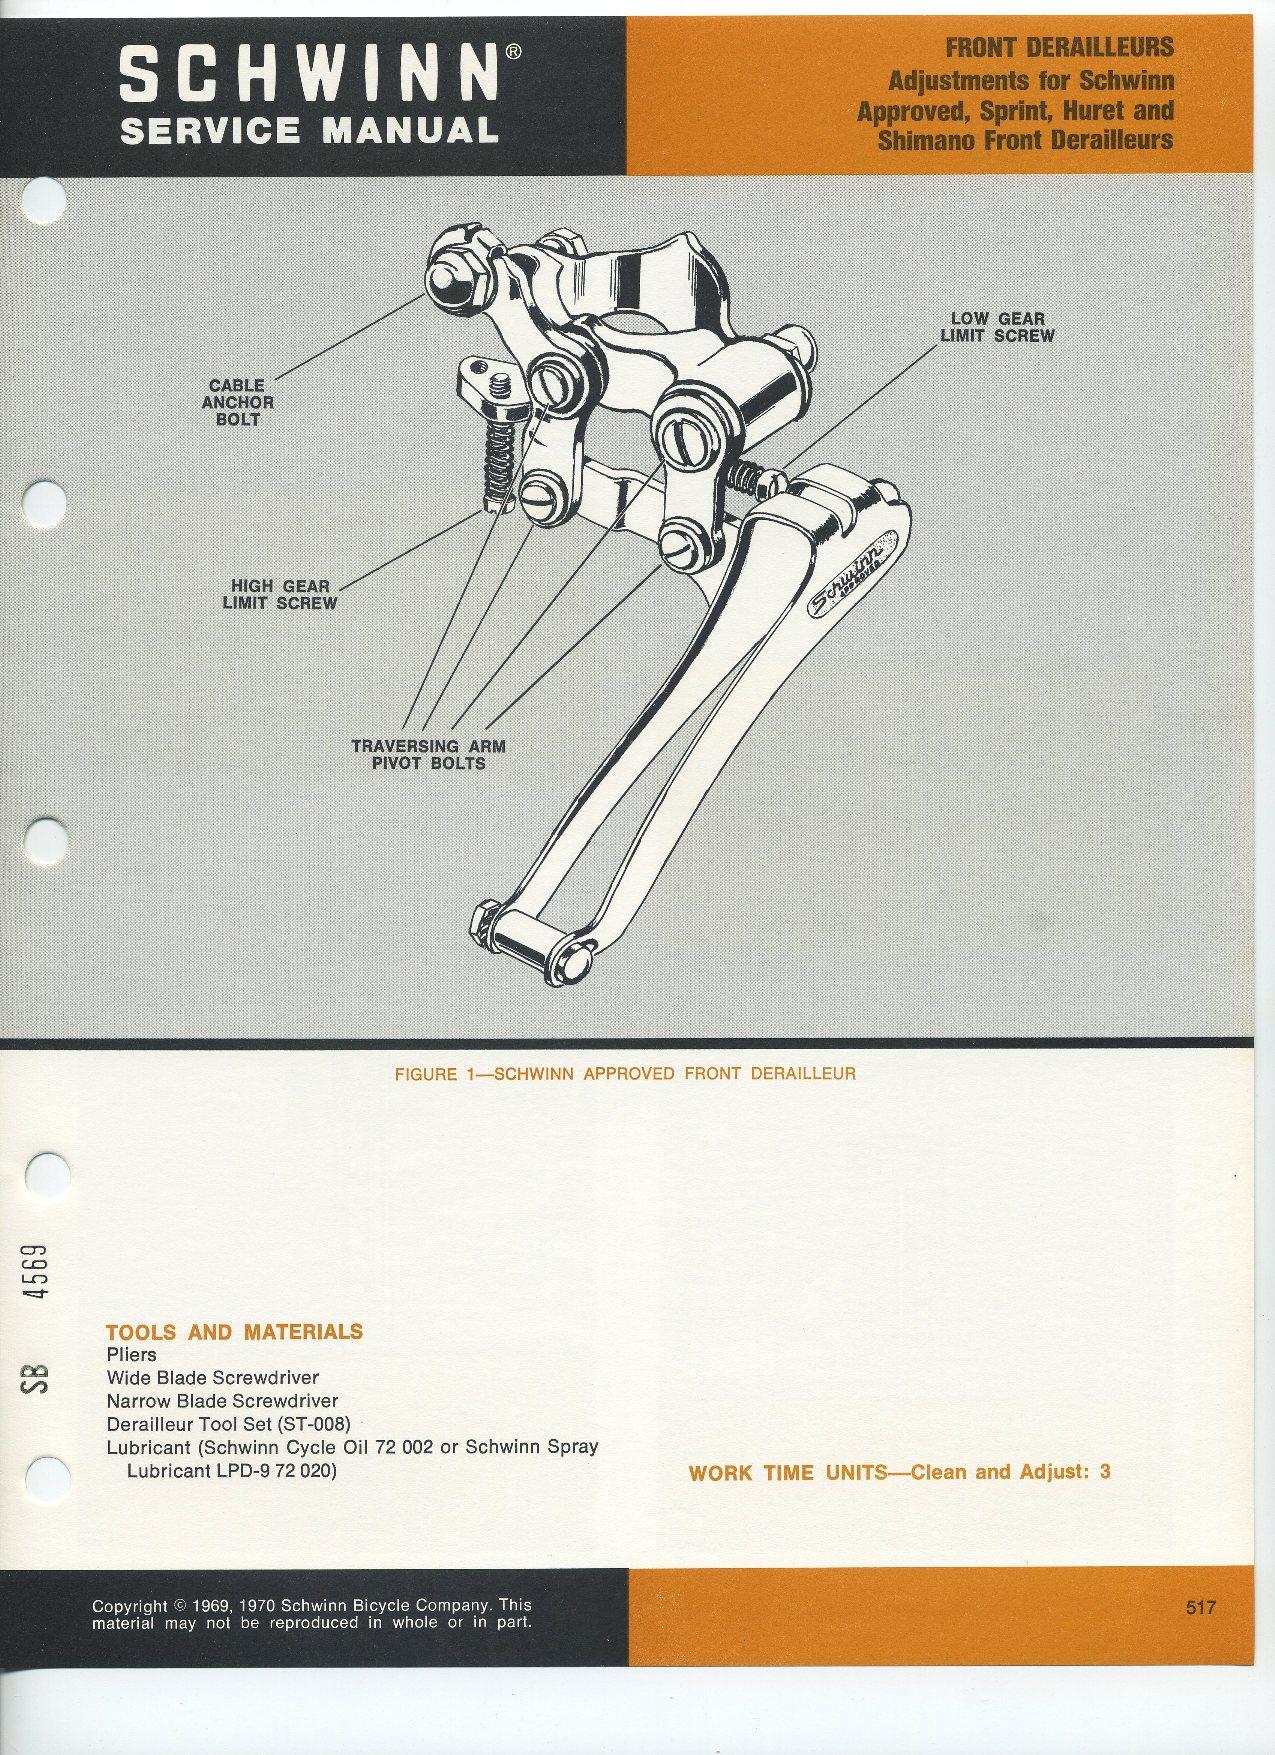 Shimano Repair Manual Toyota Celica A40 1978 Wiring Diagrams Repairmanuals Array Sldb 1969 70 Derailleurs Pg 517 Rh Schwinnbikeforum Com